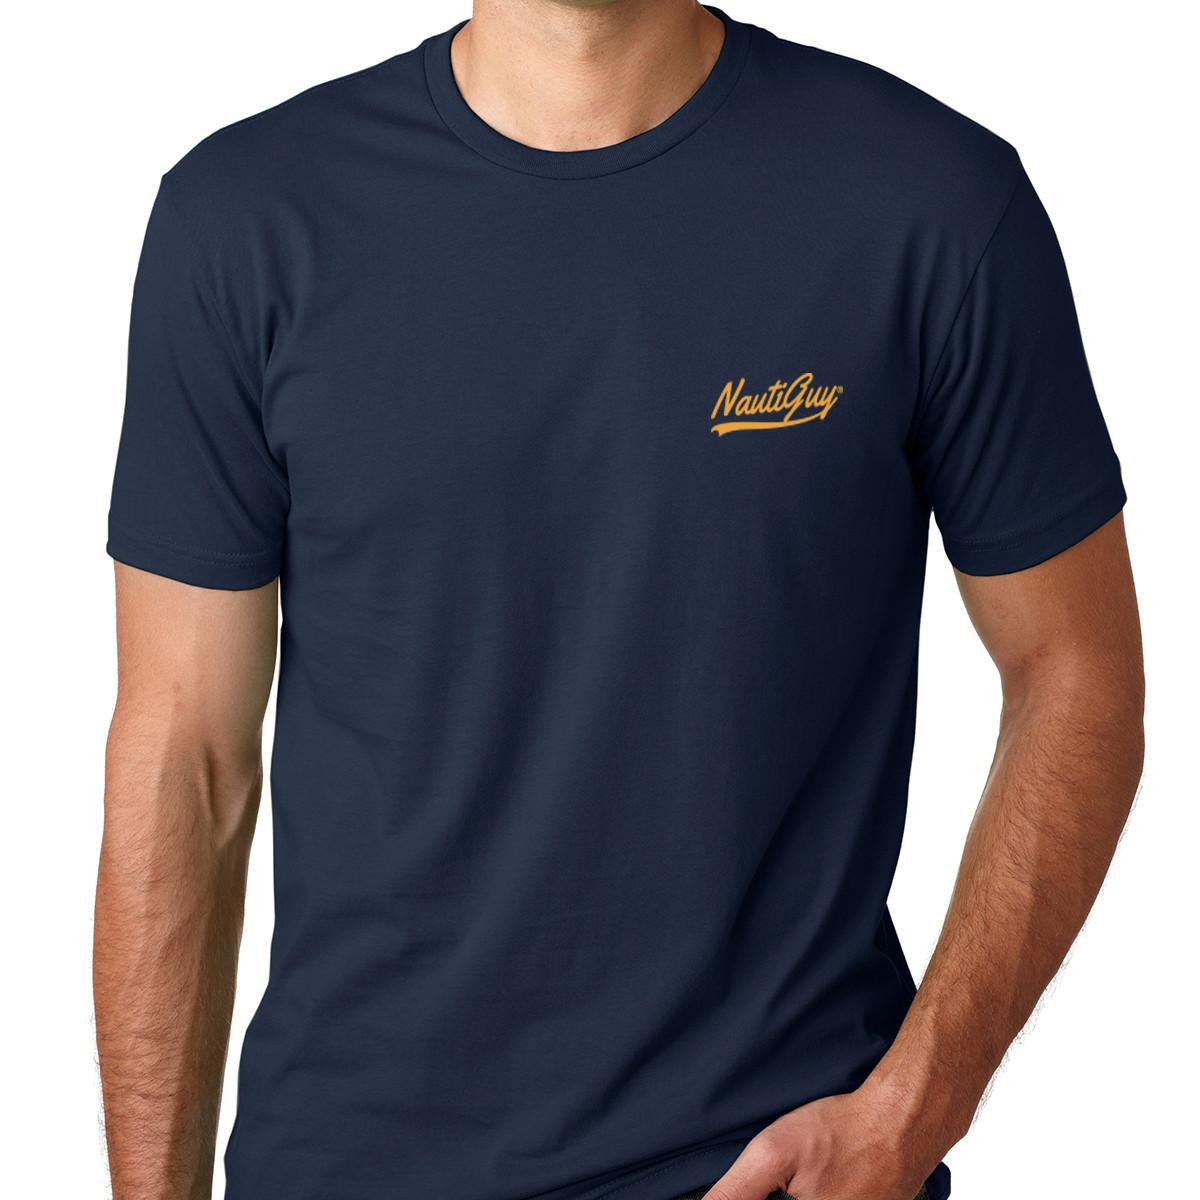 151b7f9bd4 Sunset & Palm Nautiguy Nautical Shirts